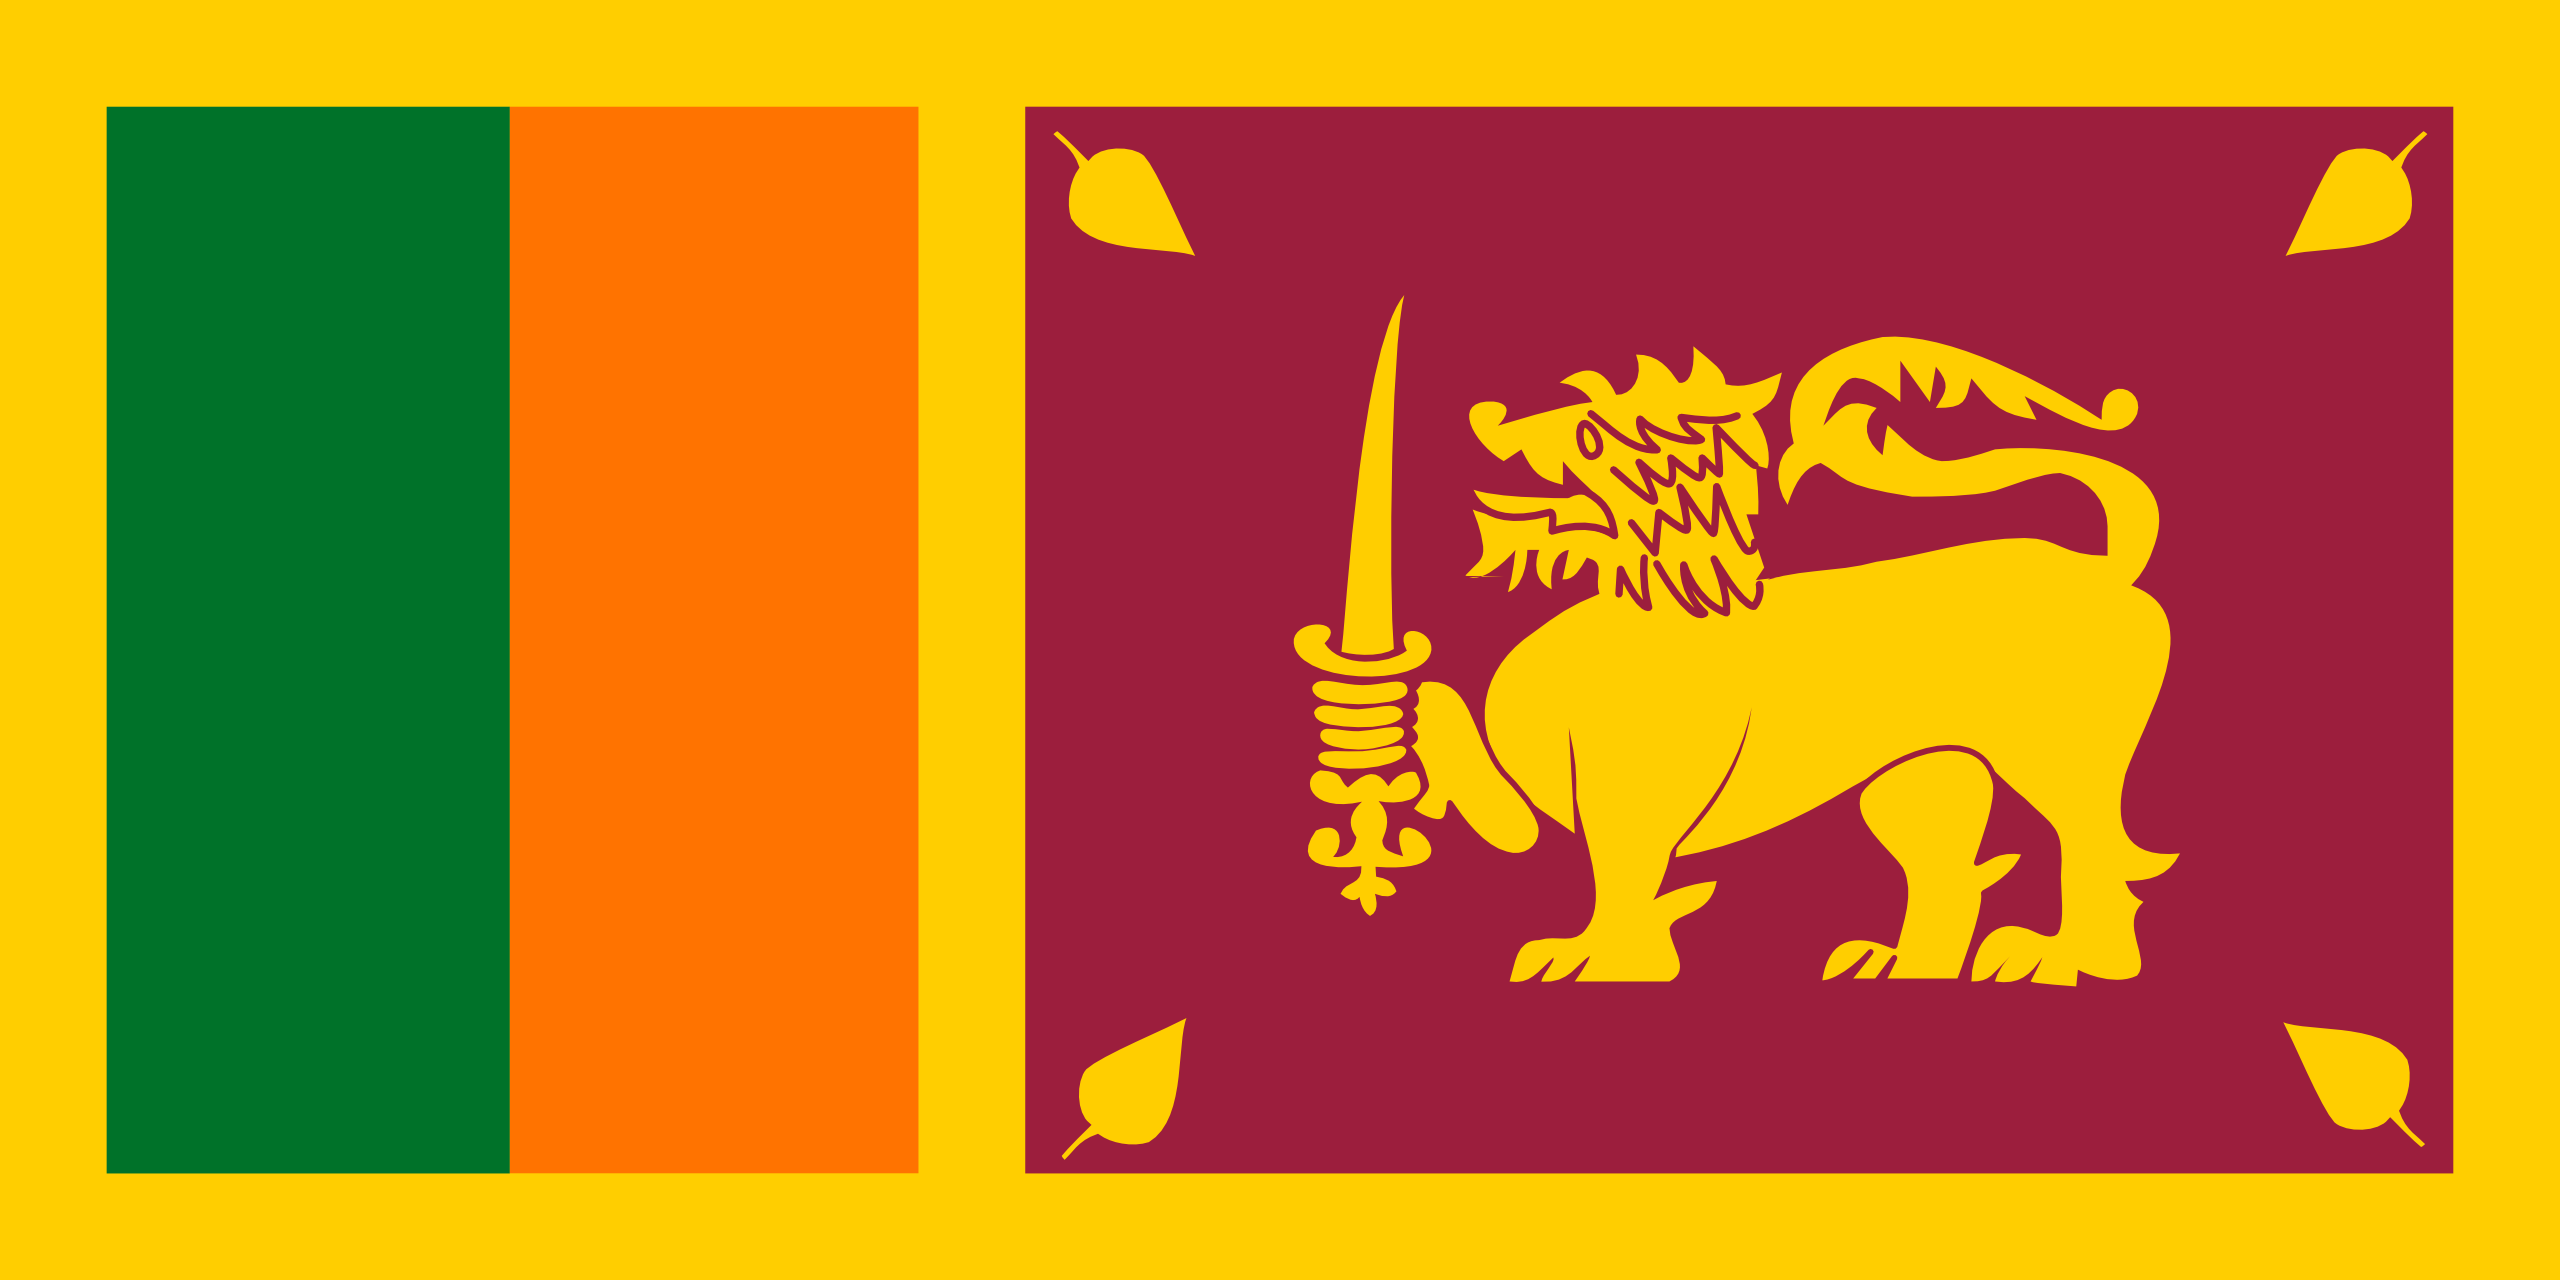 sri lanka, χώρα, έμβλημα, λογότυπο, σύμβολο - Wallpapers HD - Professor-falken.com